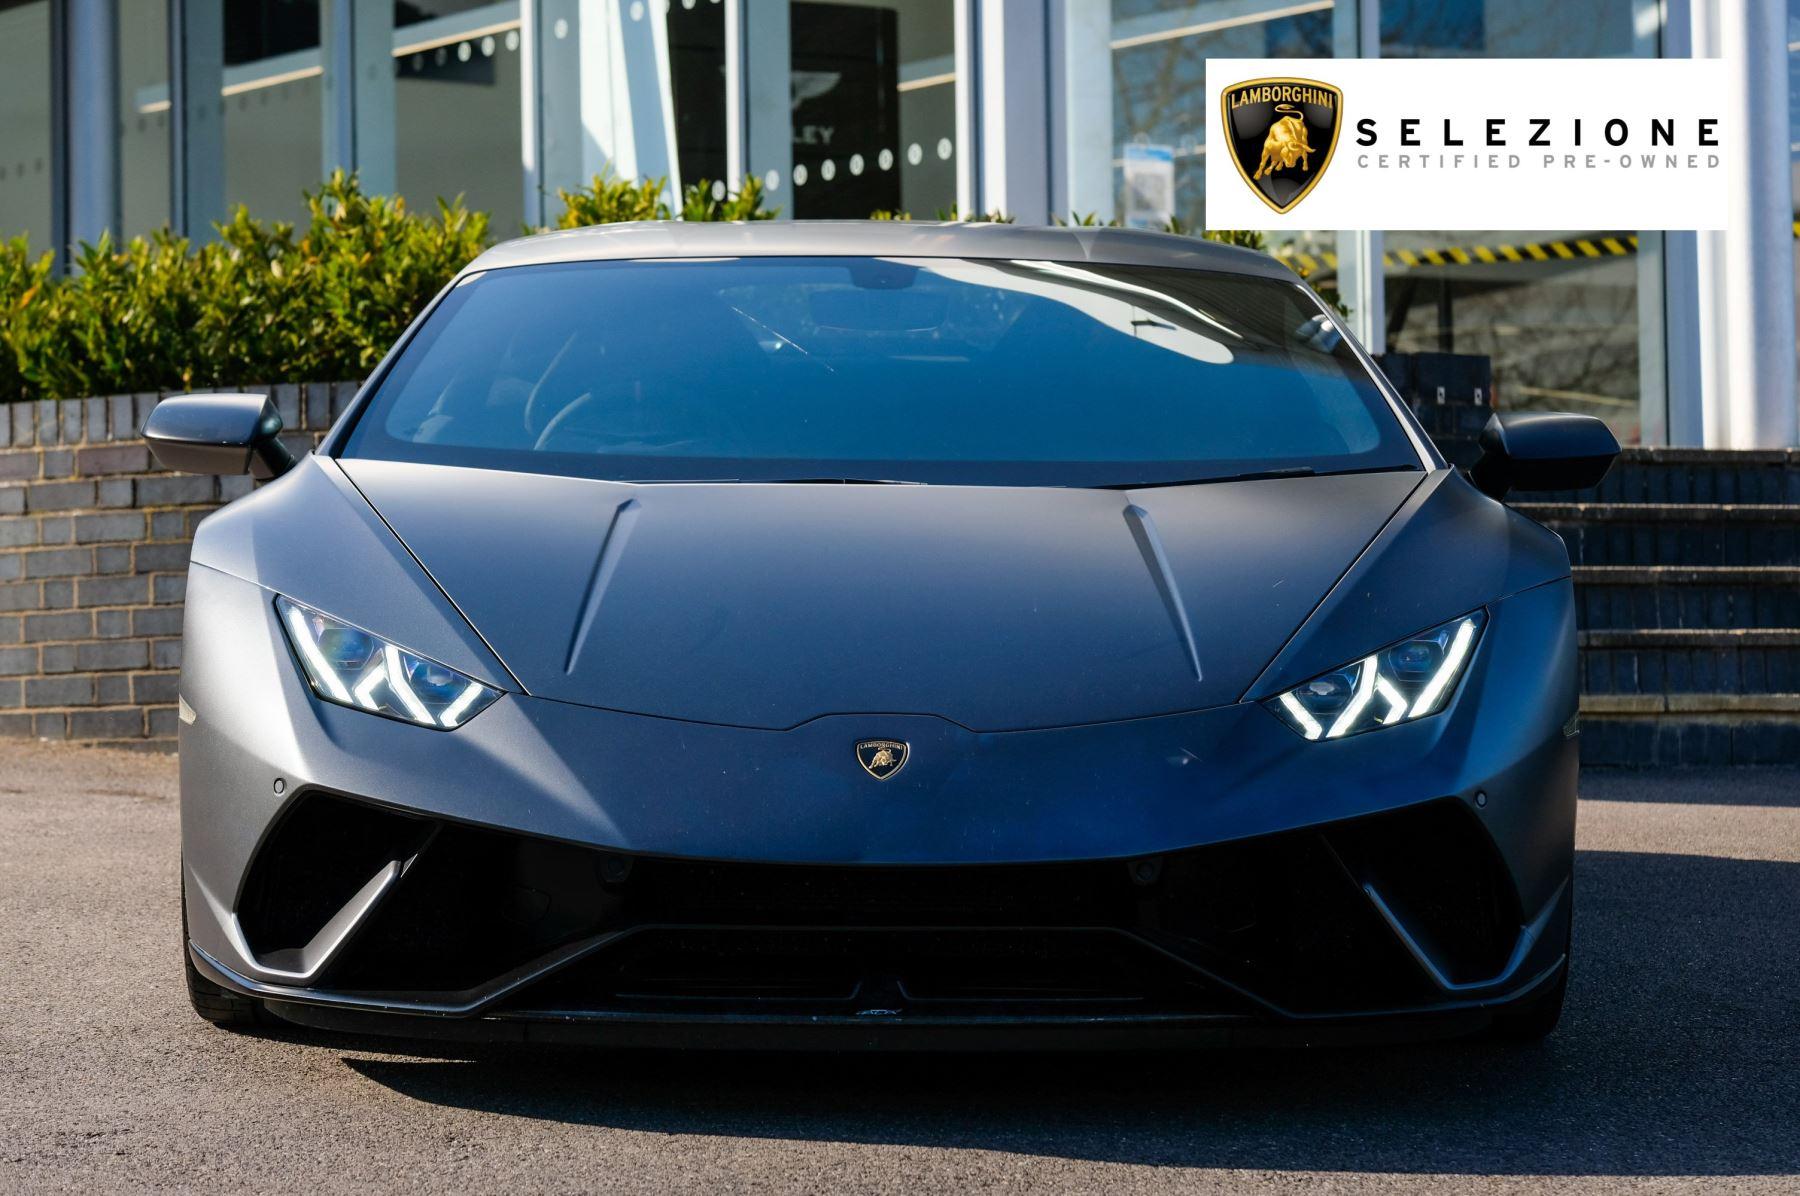 Lamborghini Huracan Performante LP 640-4 2dr LDF - Carbon Ceramic Brakes - Carbon Fiber Features - Comfort Seats image 5